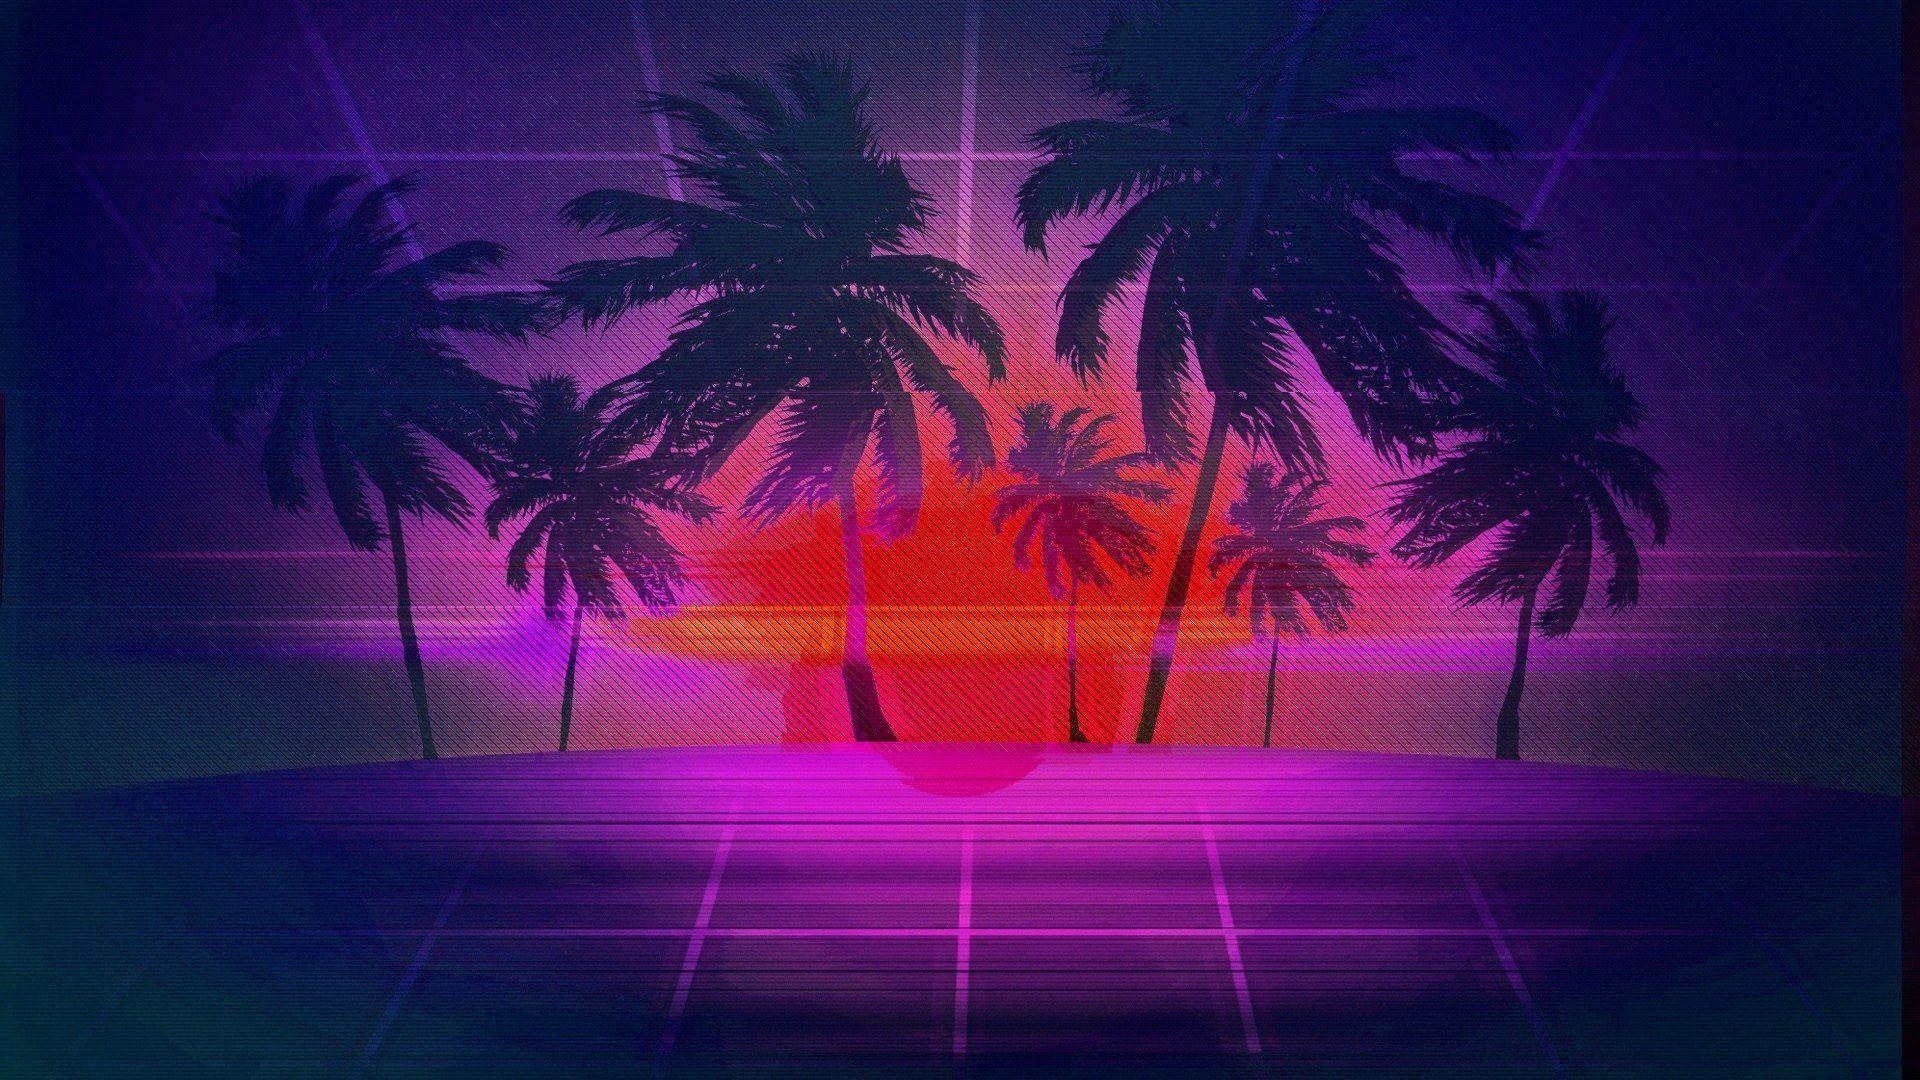 vaporwave desktop wallpaper